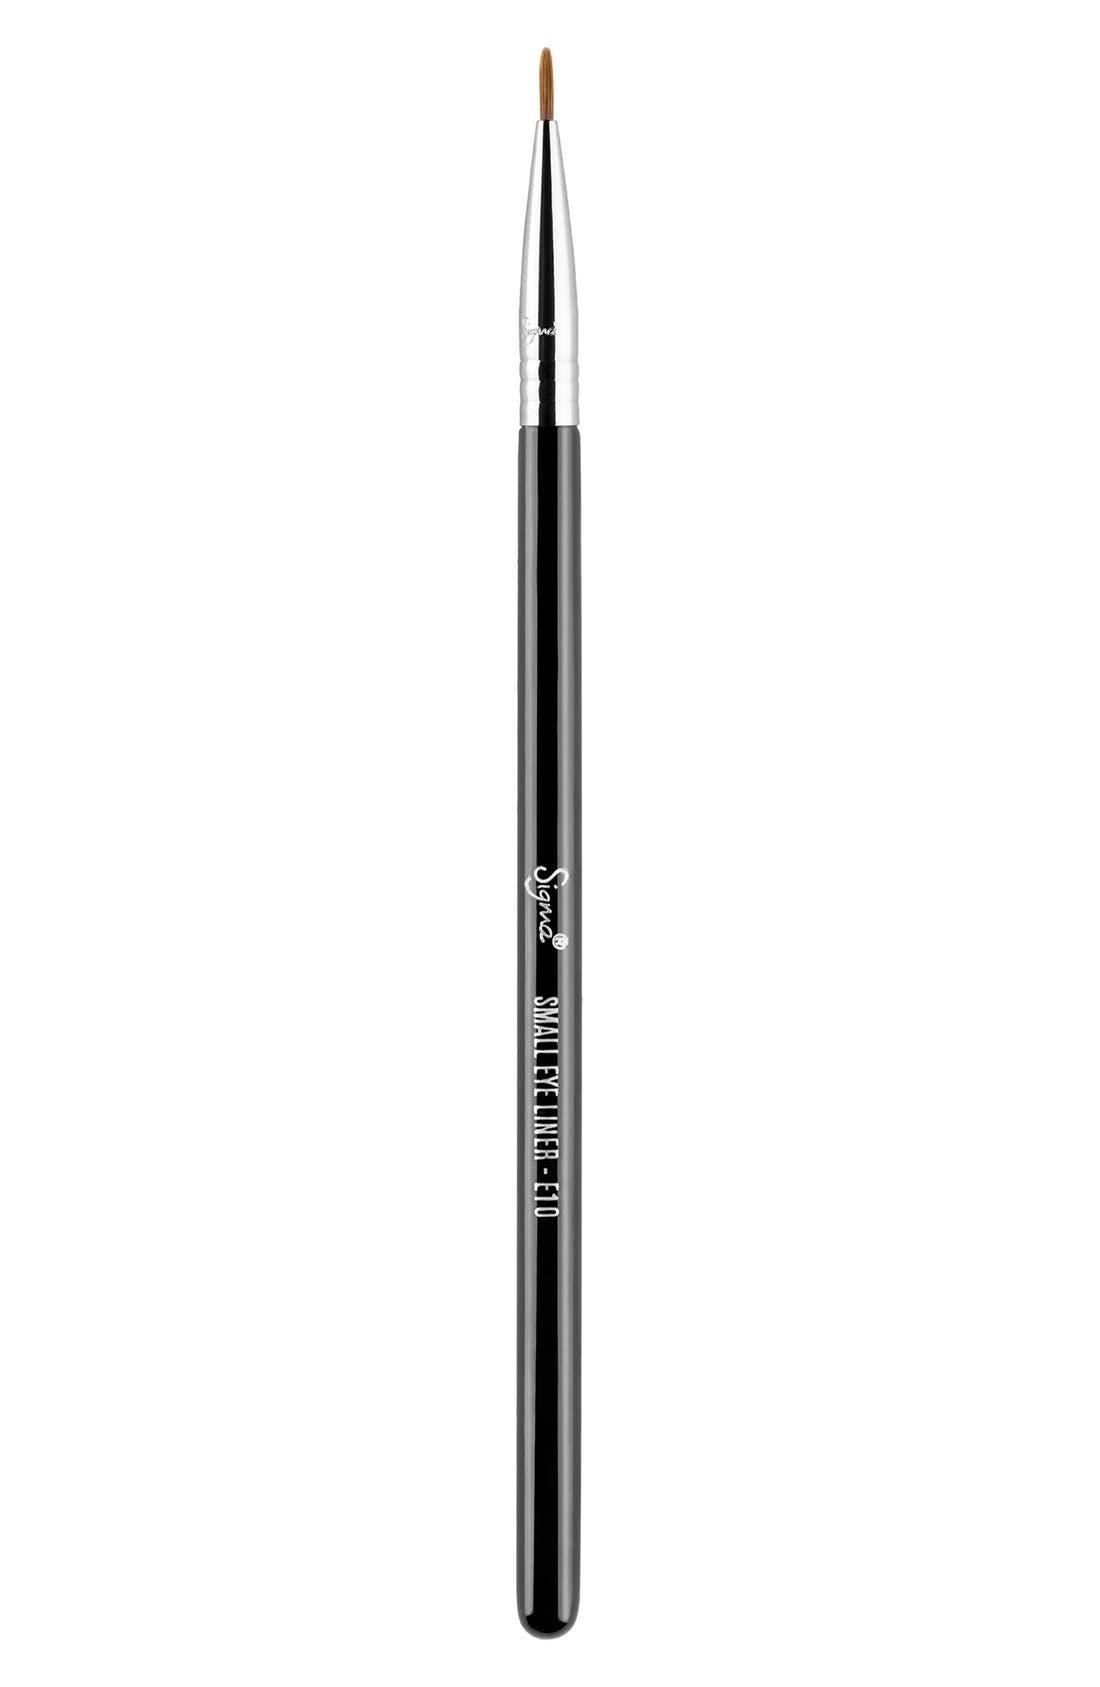 E10 Small Eye Liner Brush,                             Main thumbnail 1, color,                             NO COLOR